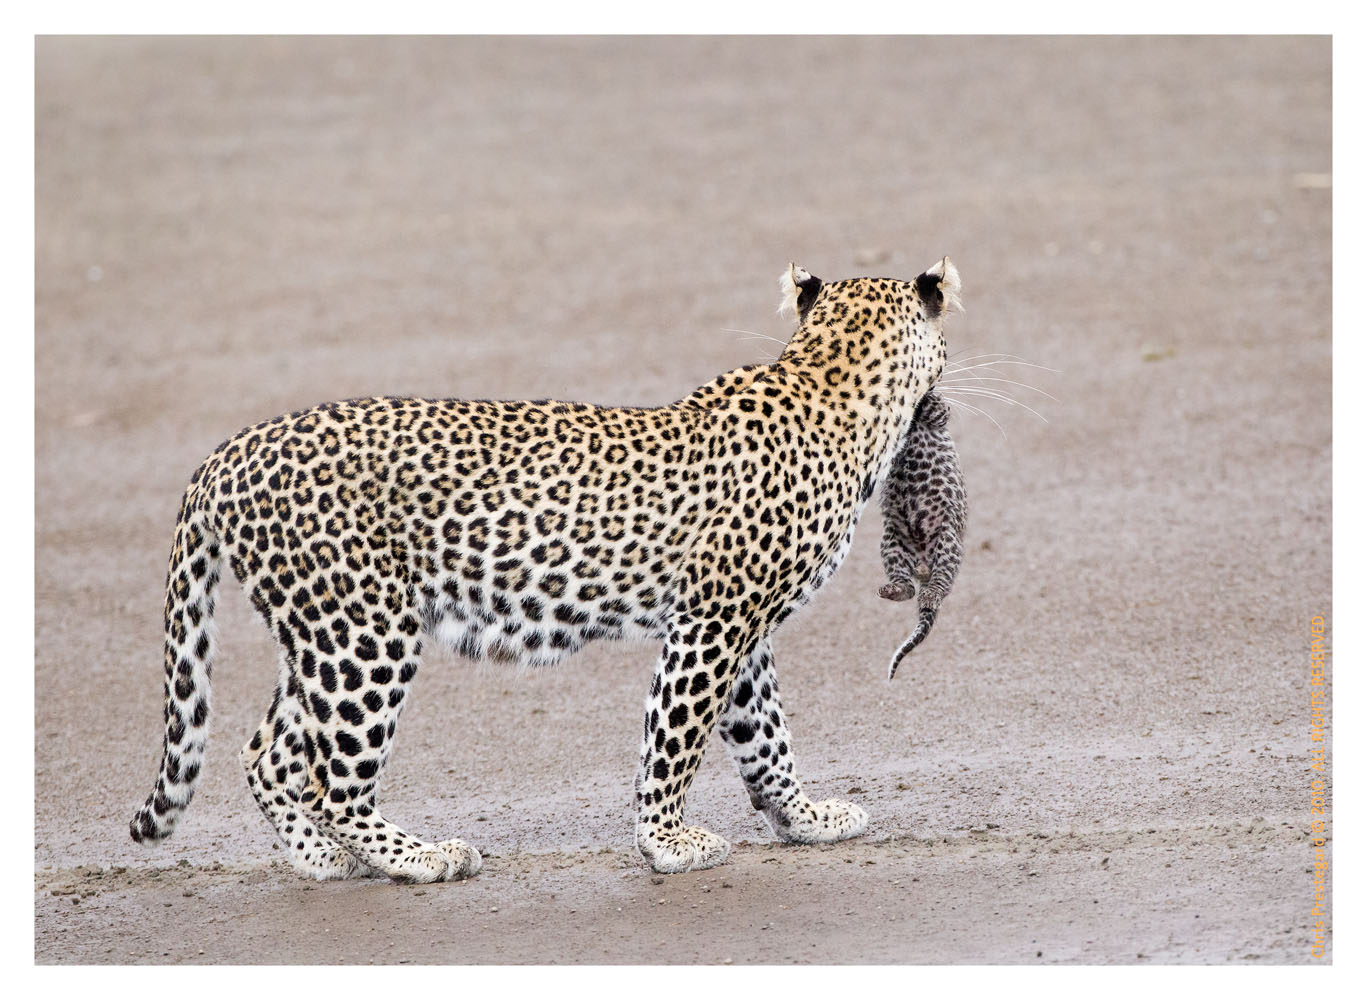 LeopardCub7151-Oct4-2013